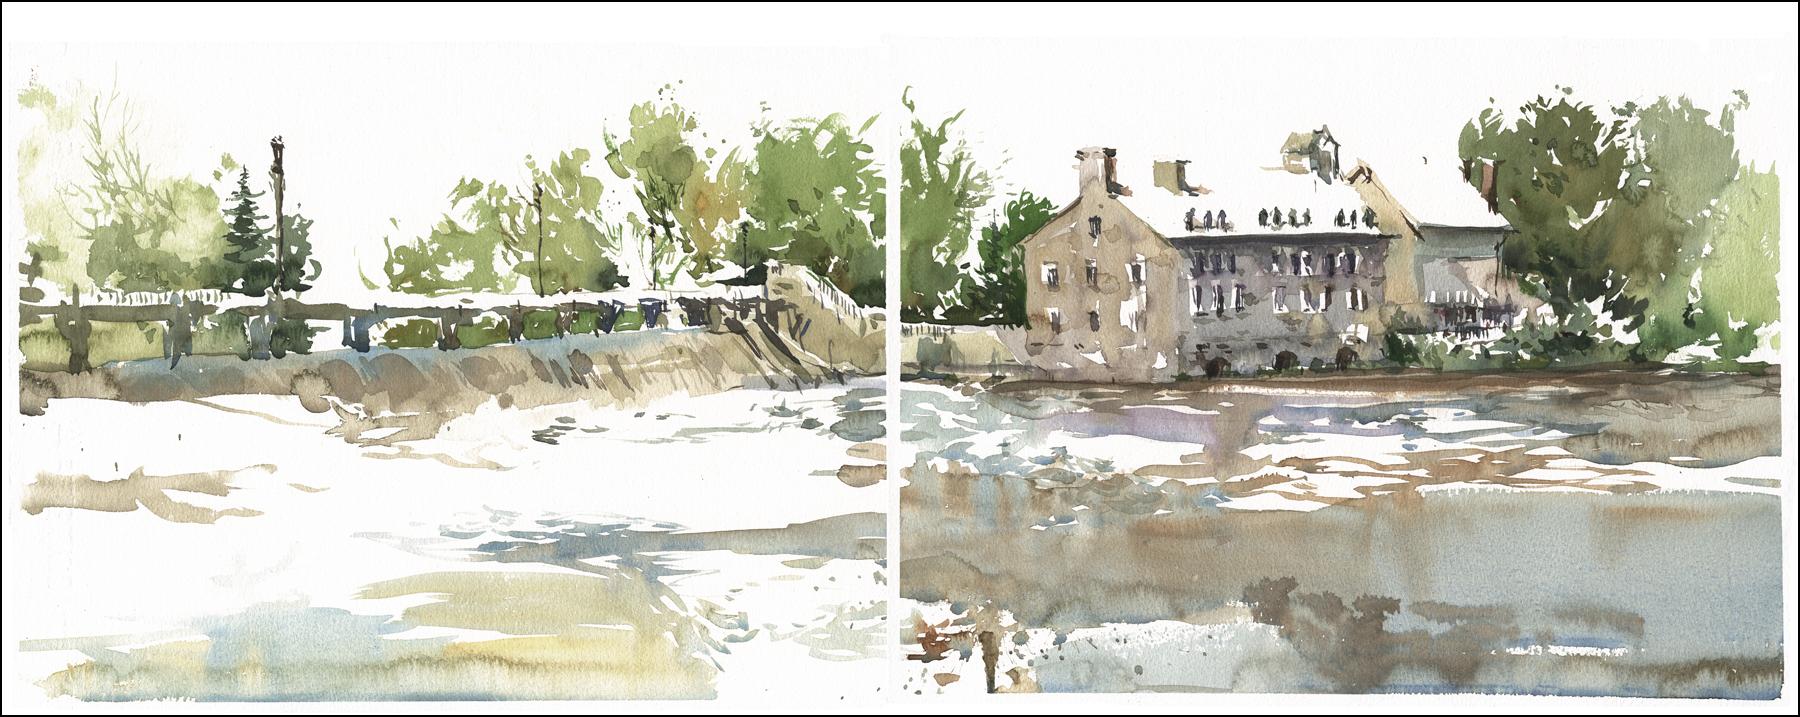 1800x717 Direct Watercolor Citizen Sketcher